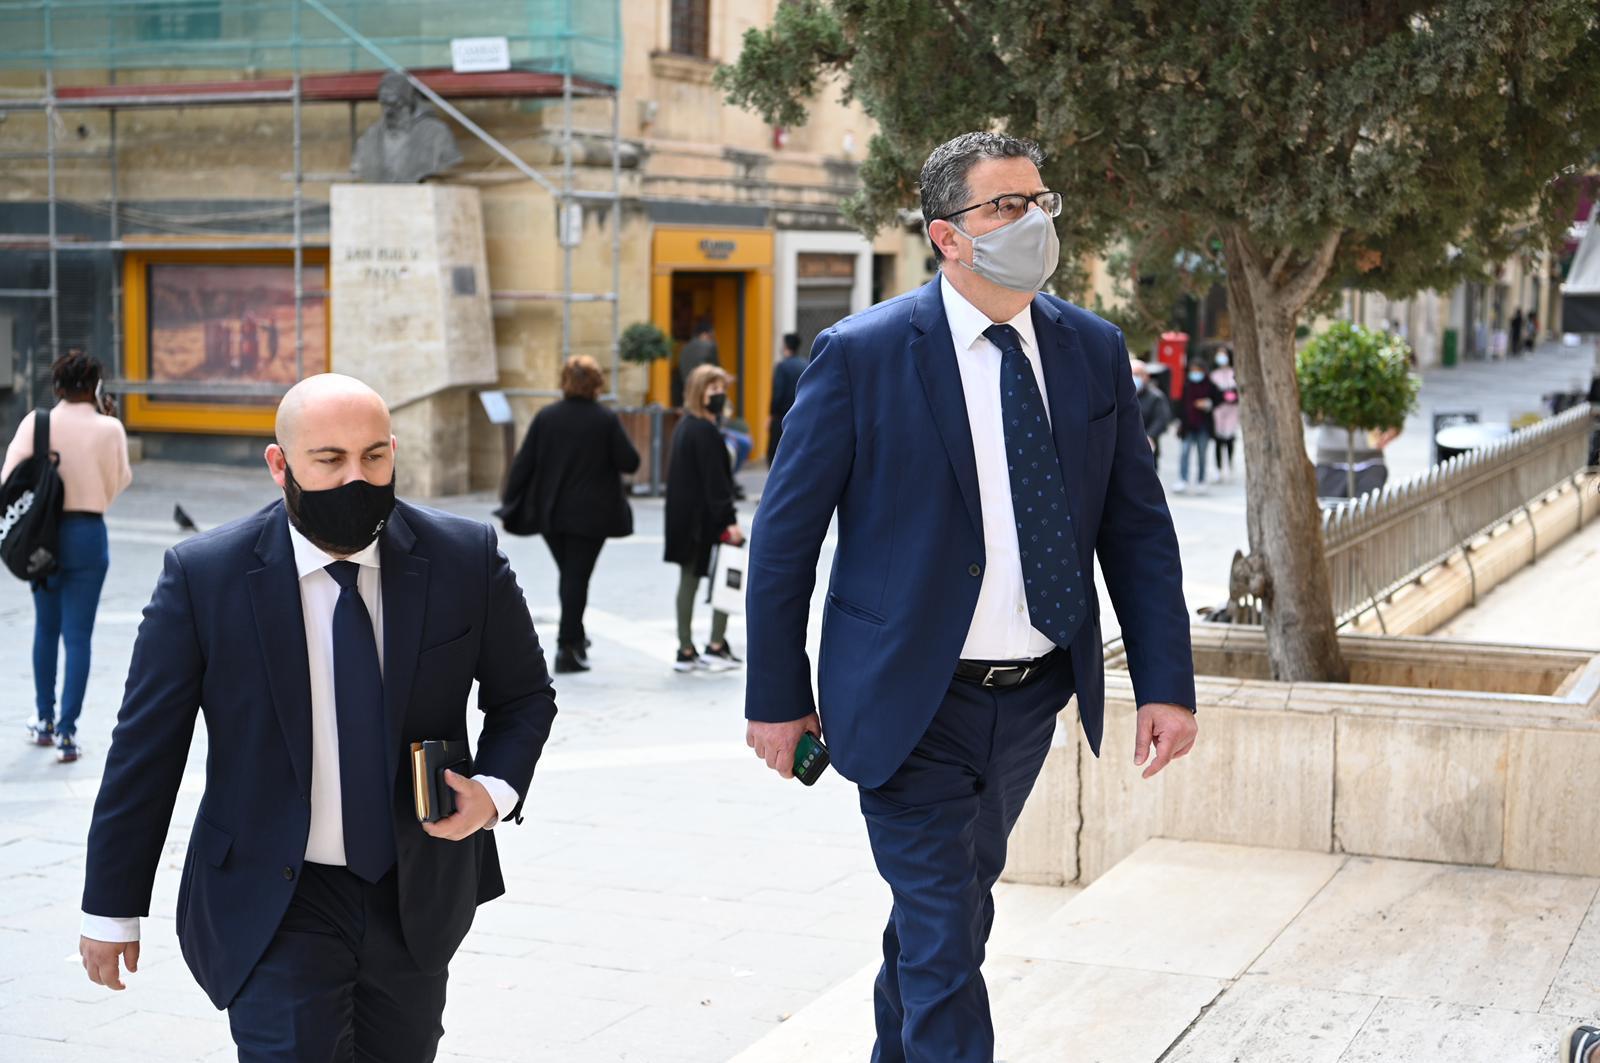 Adrian Delia entering the Valletta law courts on Wednesday. Photo: Mark Zammit Cordina